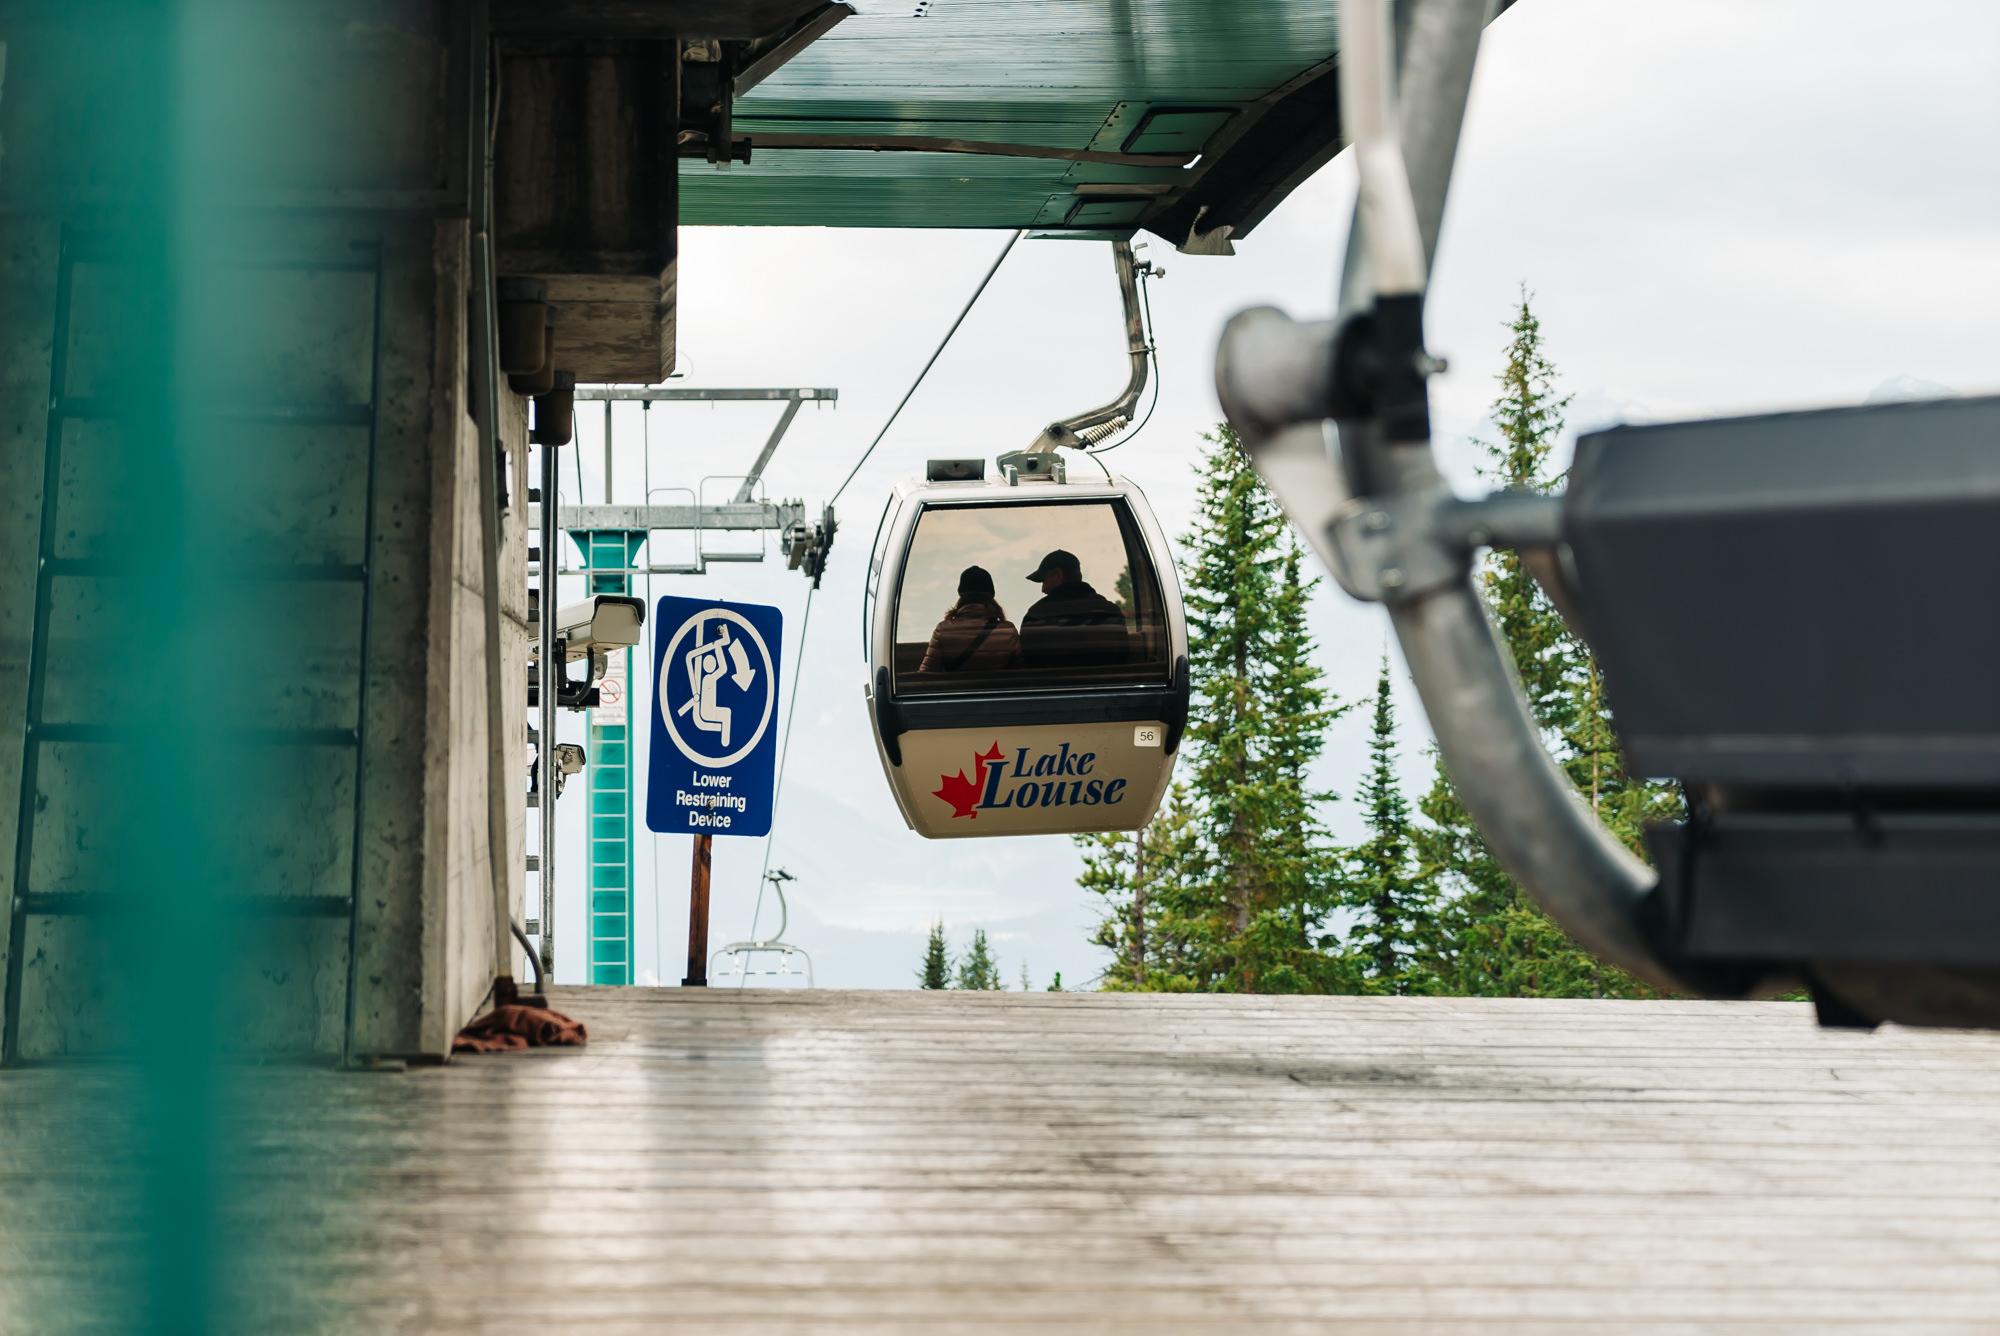 Lake Louise Gondola #Banff #LakeLouise